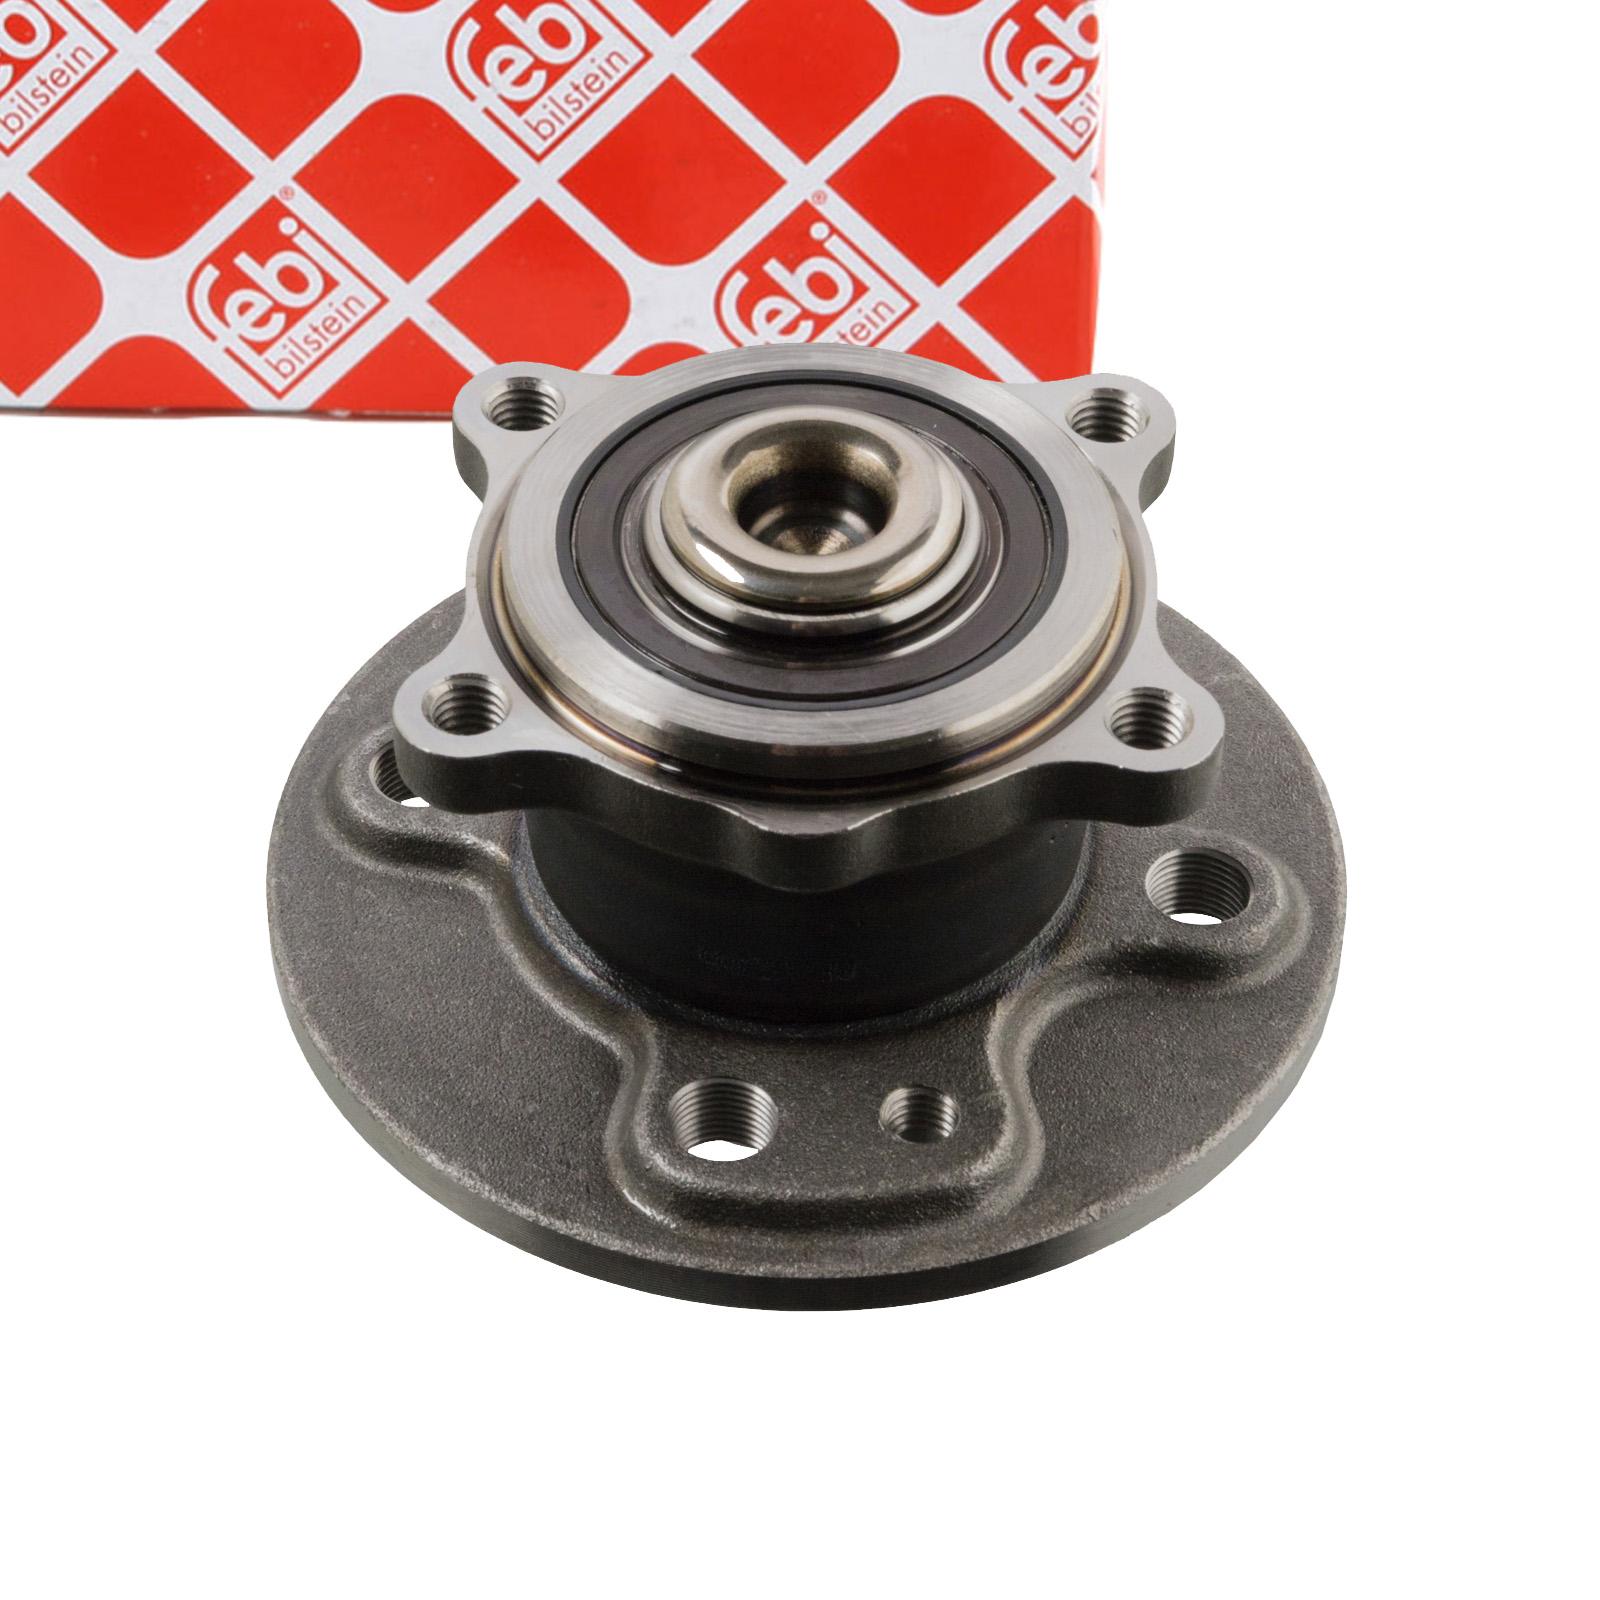 FEBI 31078 Radlagersatz Radnabe MINI R50 R52 R53 R55 R56 R57 R58 R59 hinten 33416786552